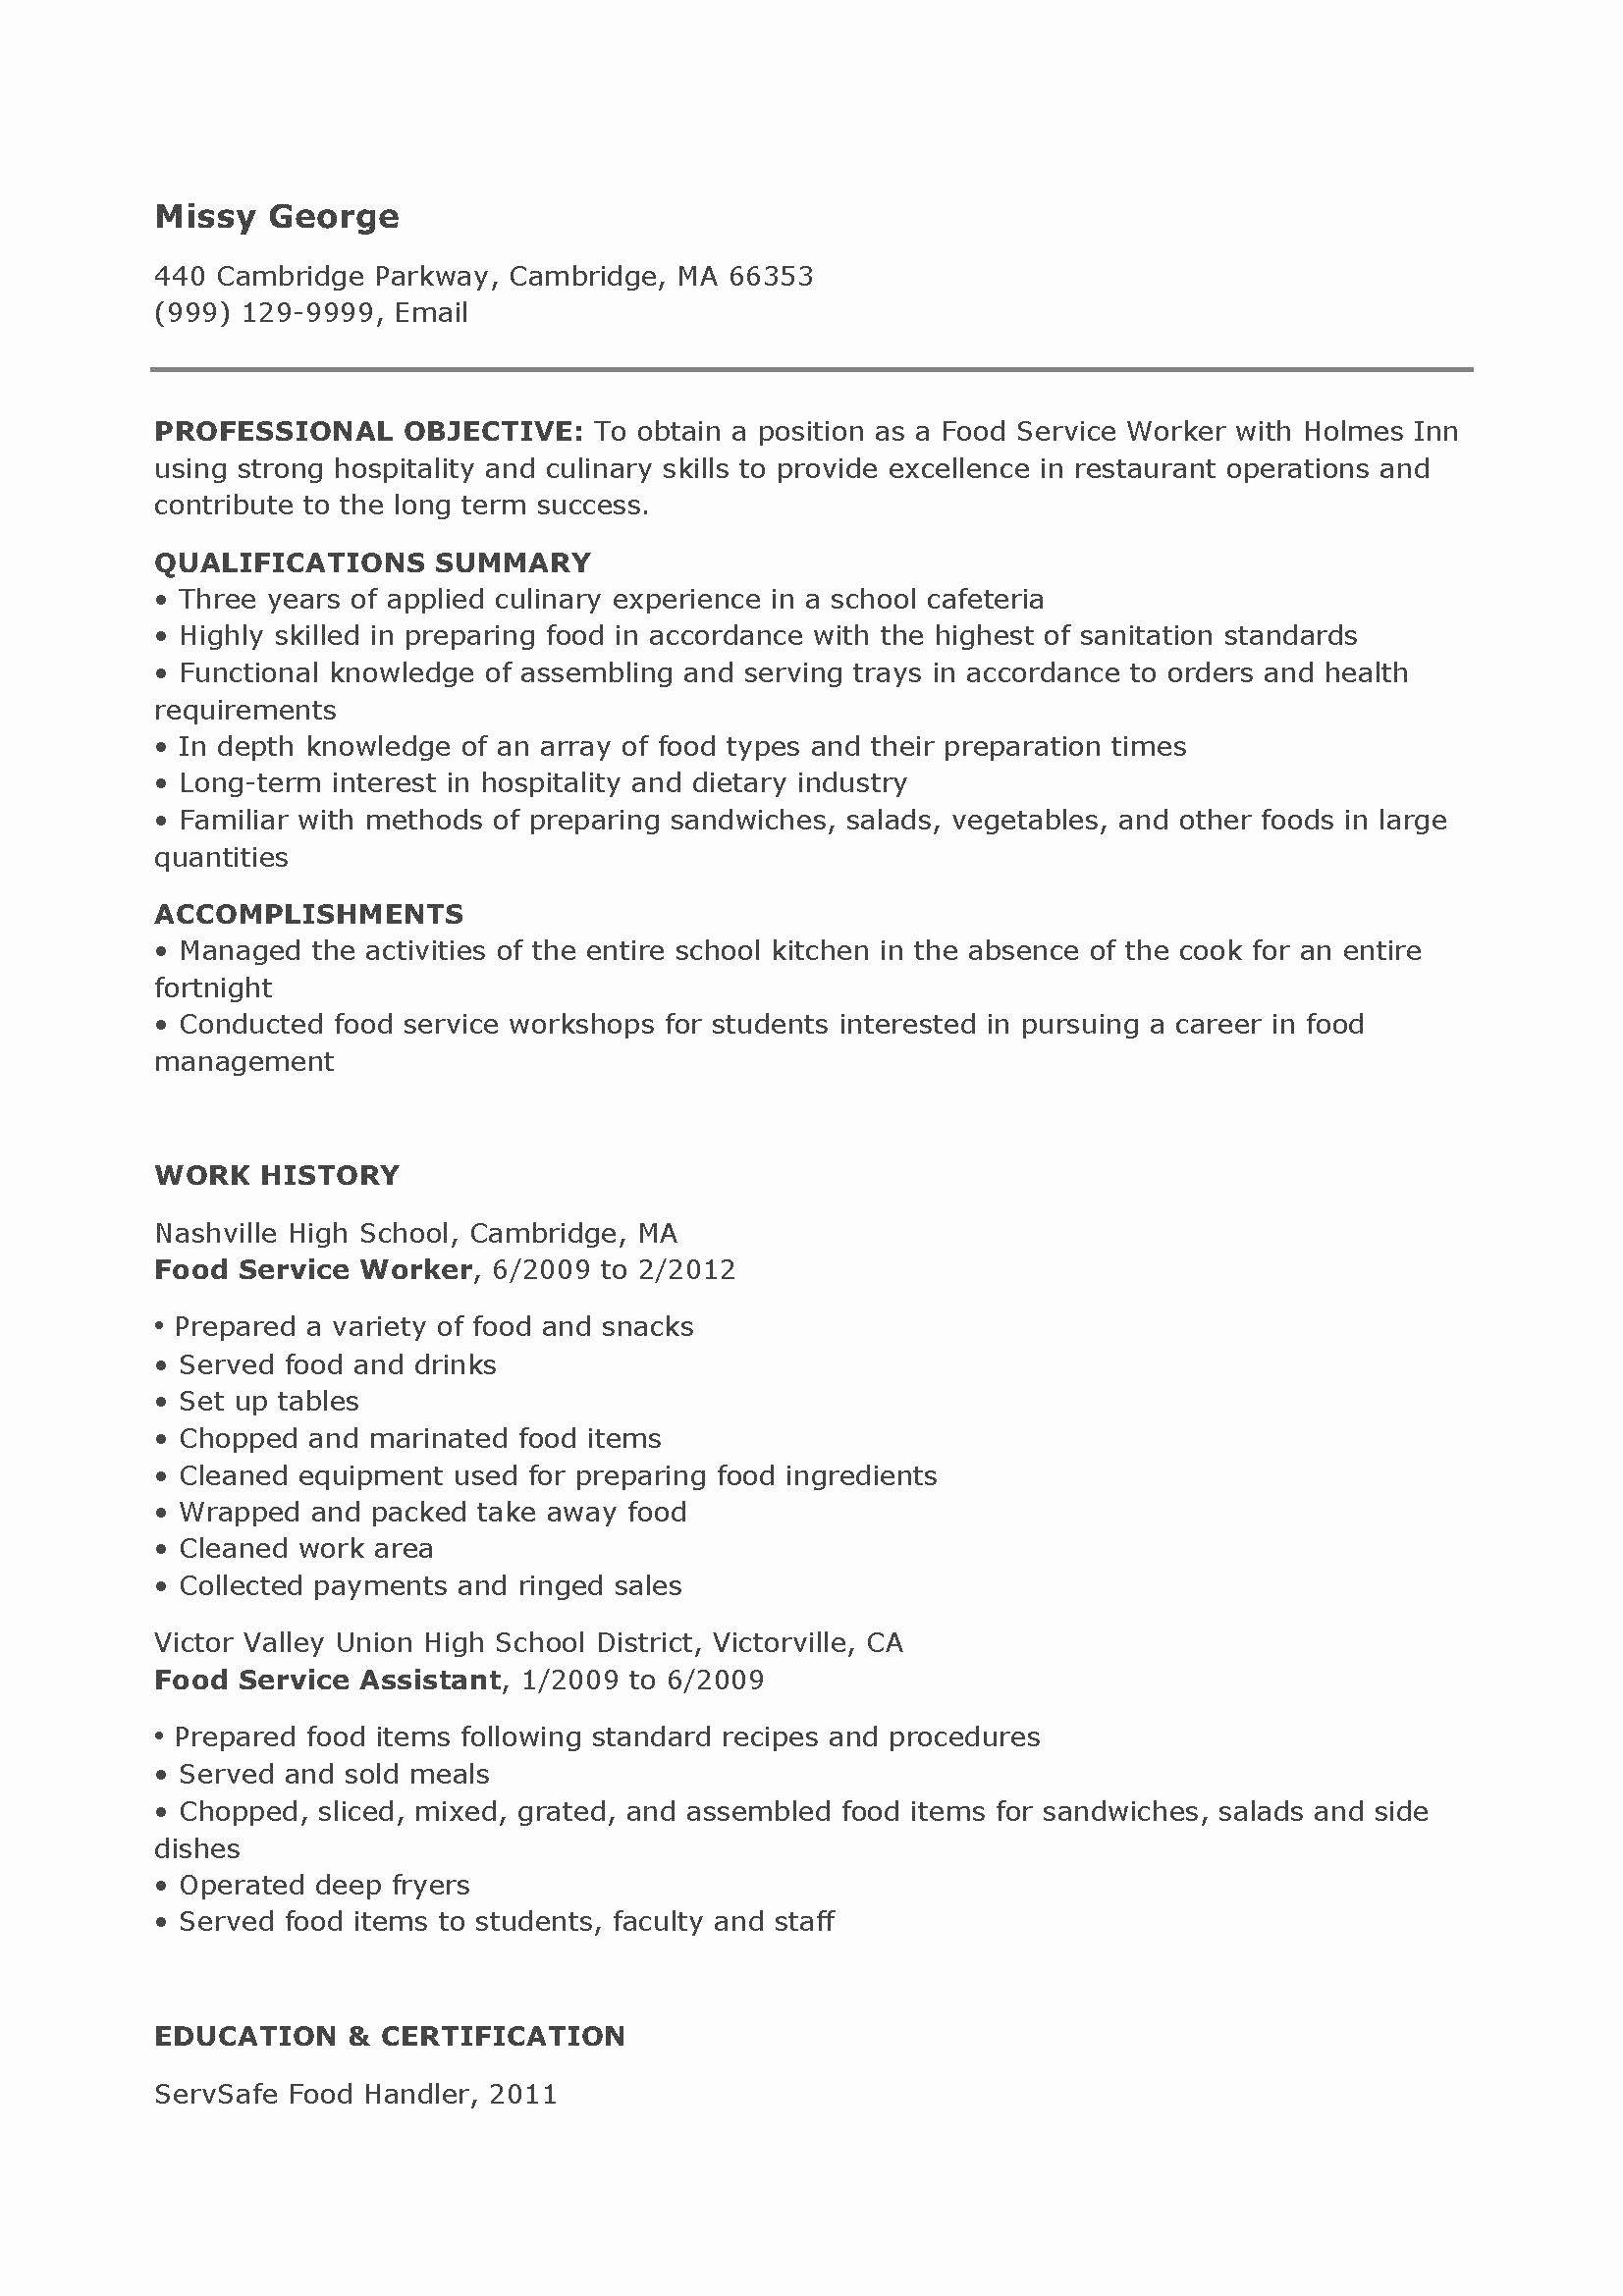 23 food service worker job description resume in 2020